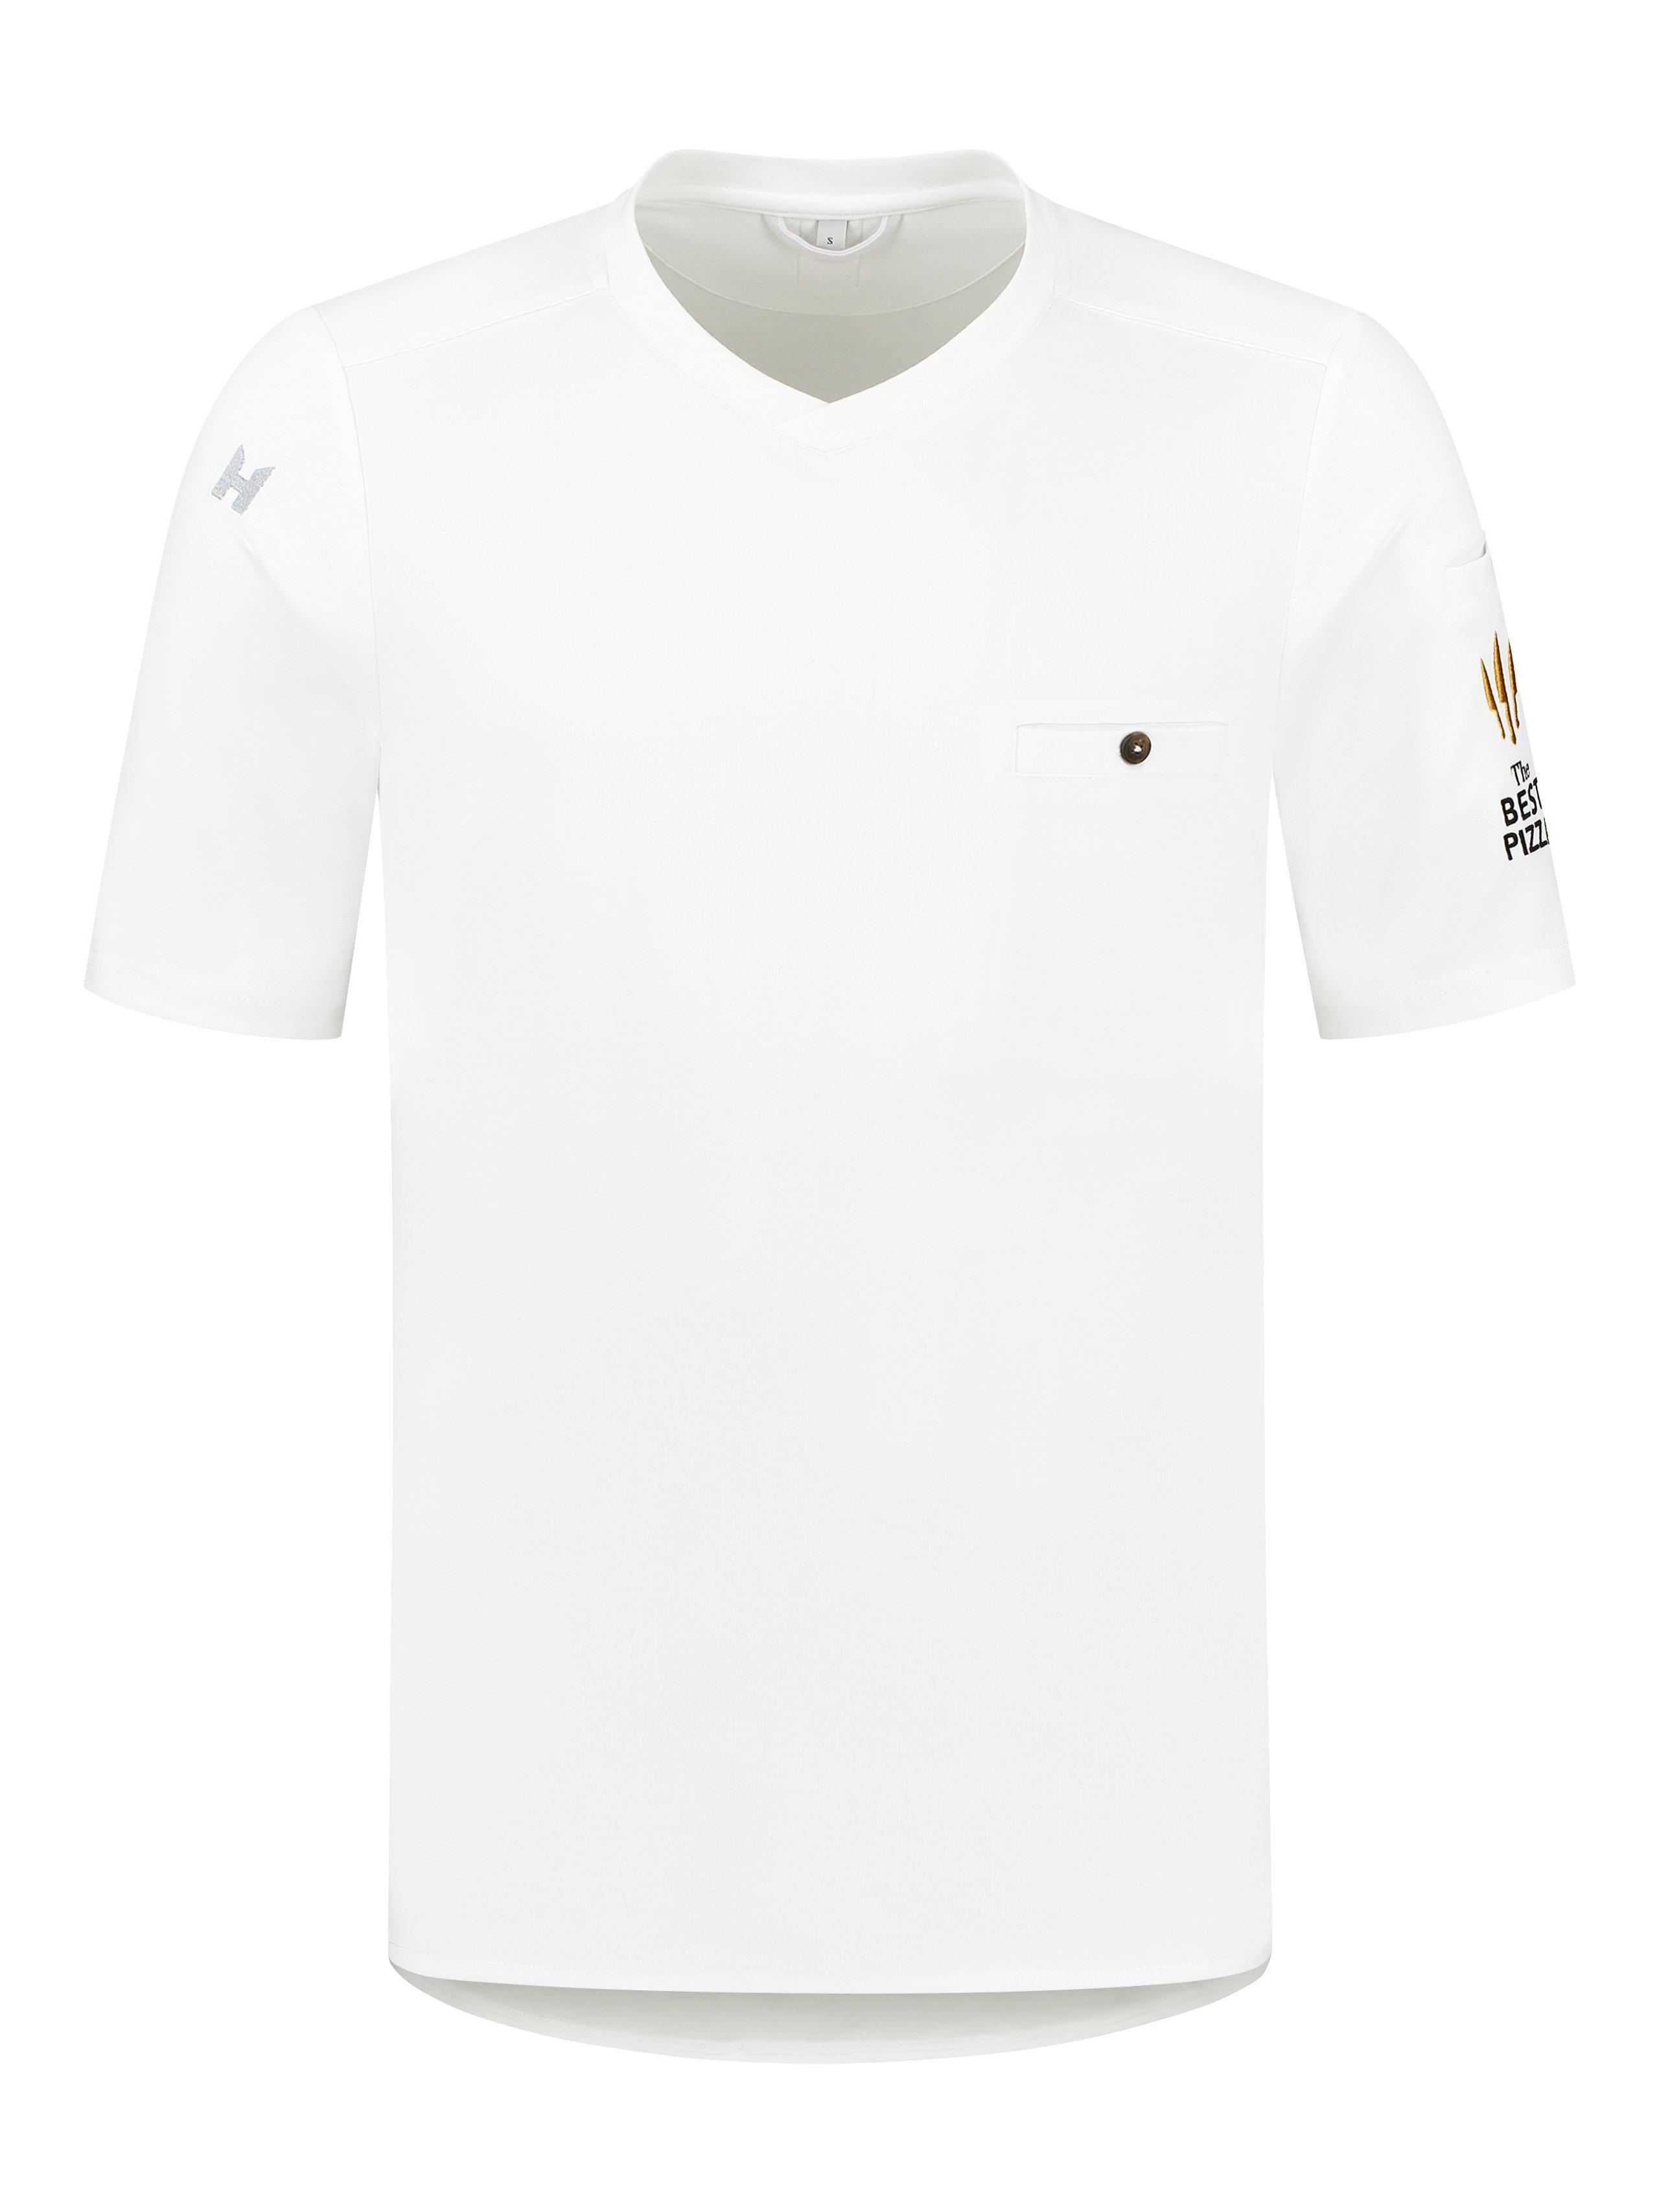 Chef Shirt The Best Pizza Ferre White